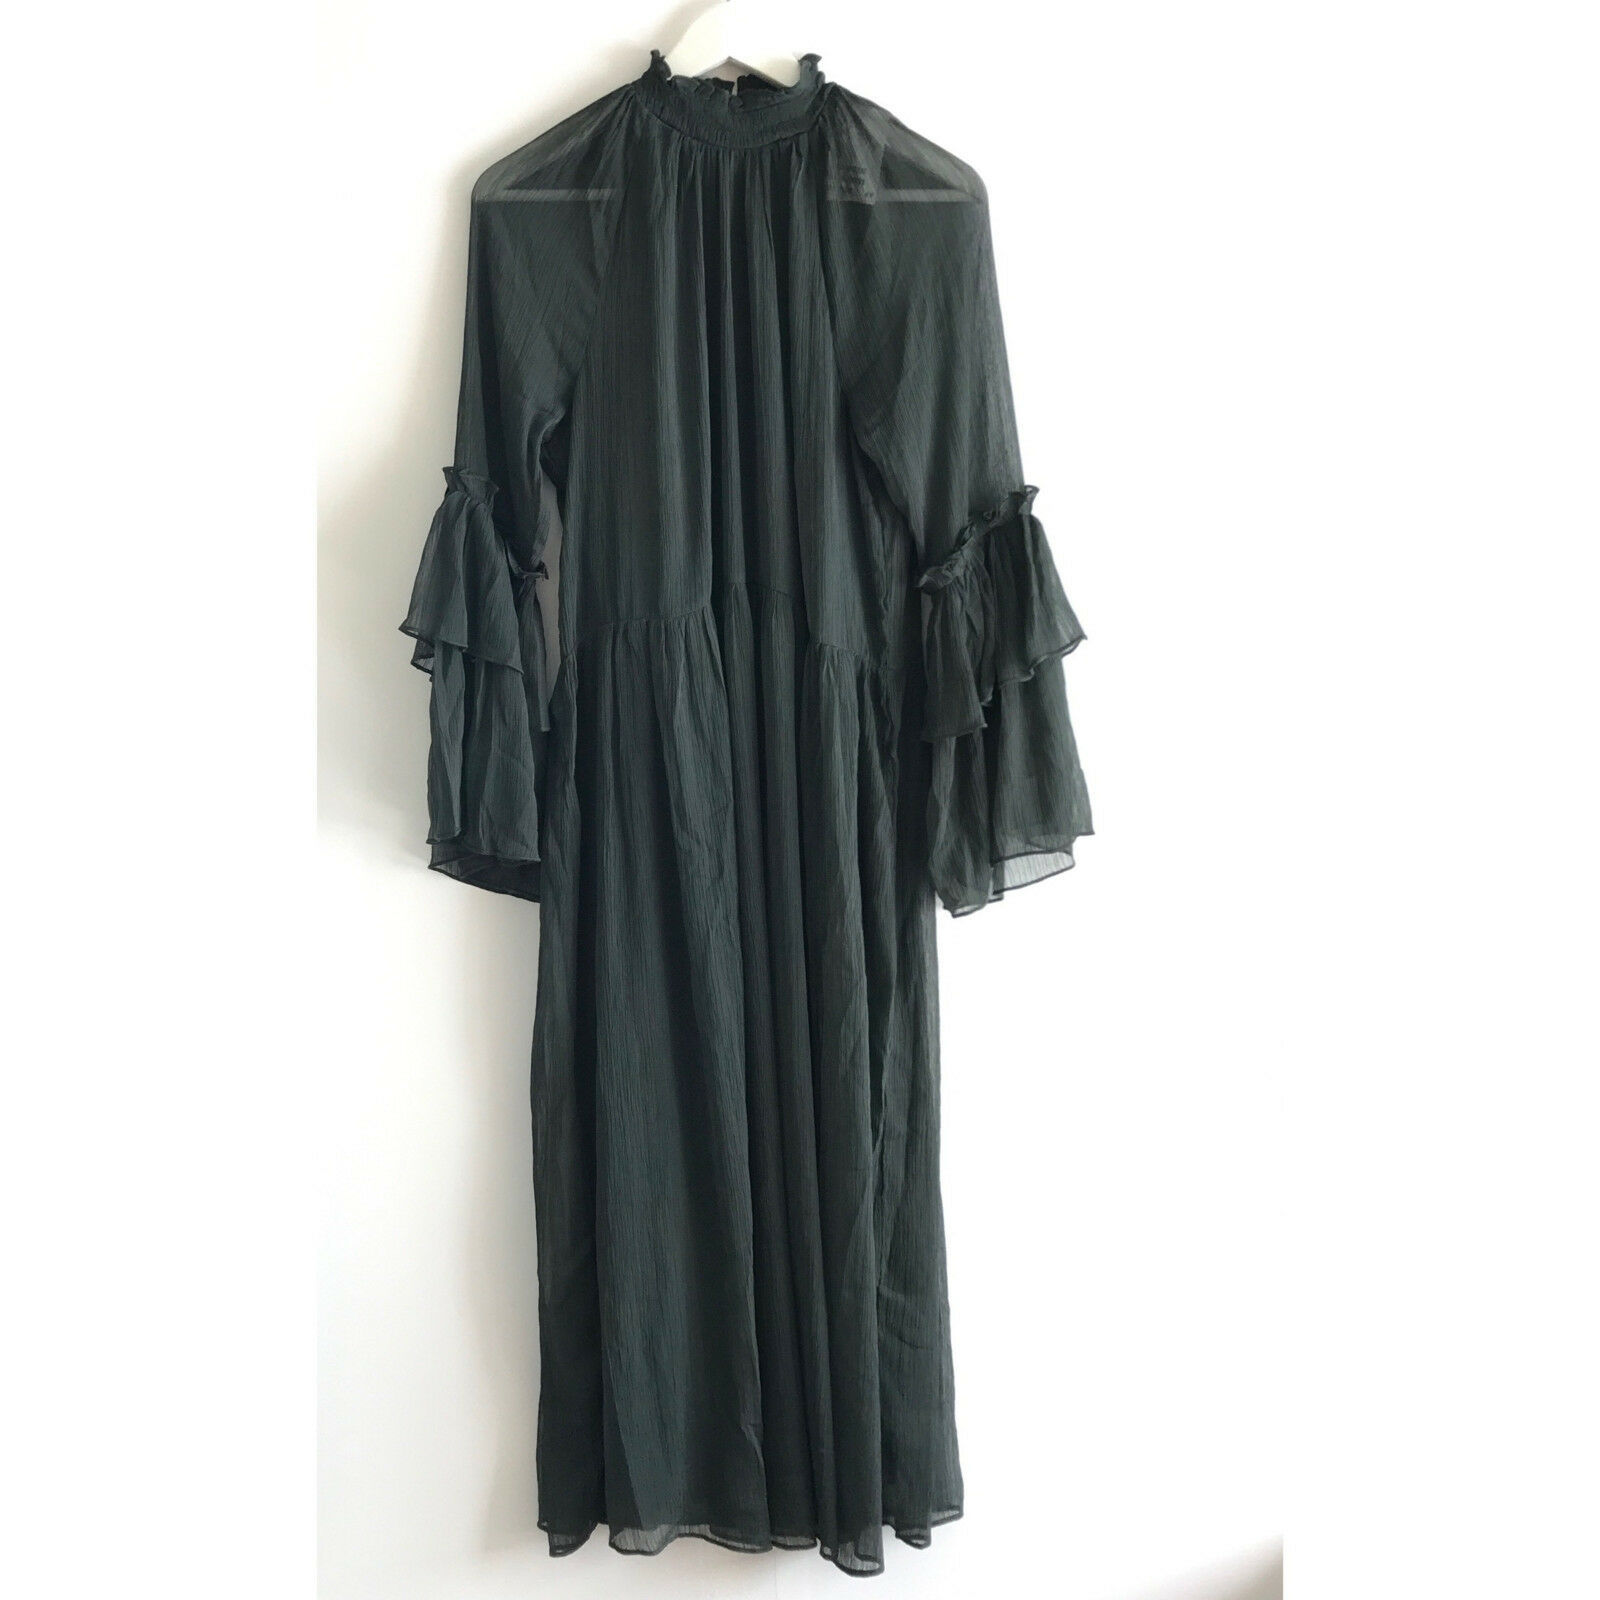 H&M CRINKLED FRILLED DRESS - Size UK VARIOUS